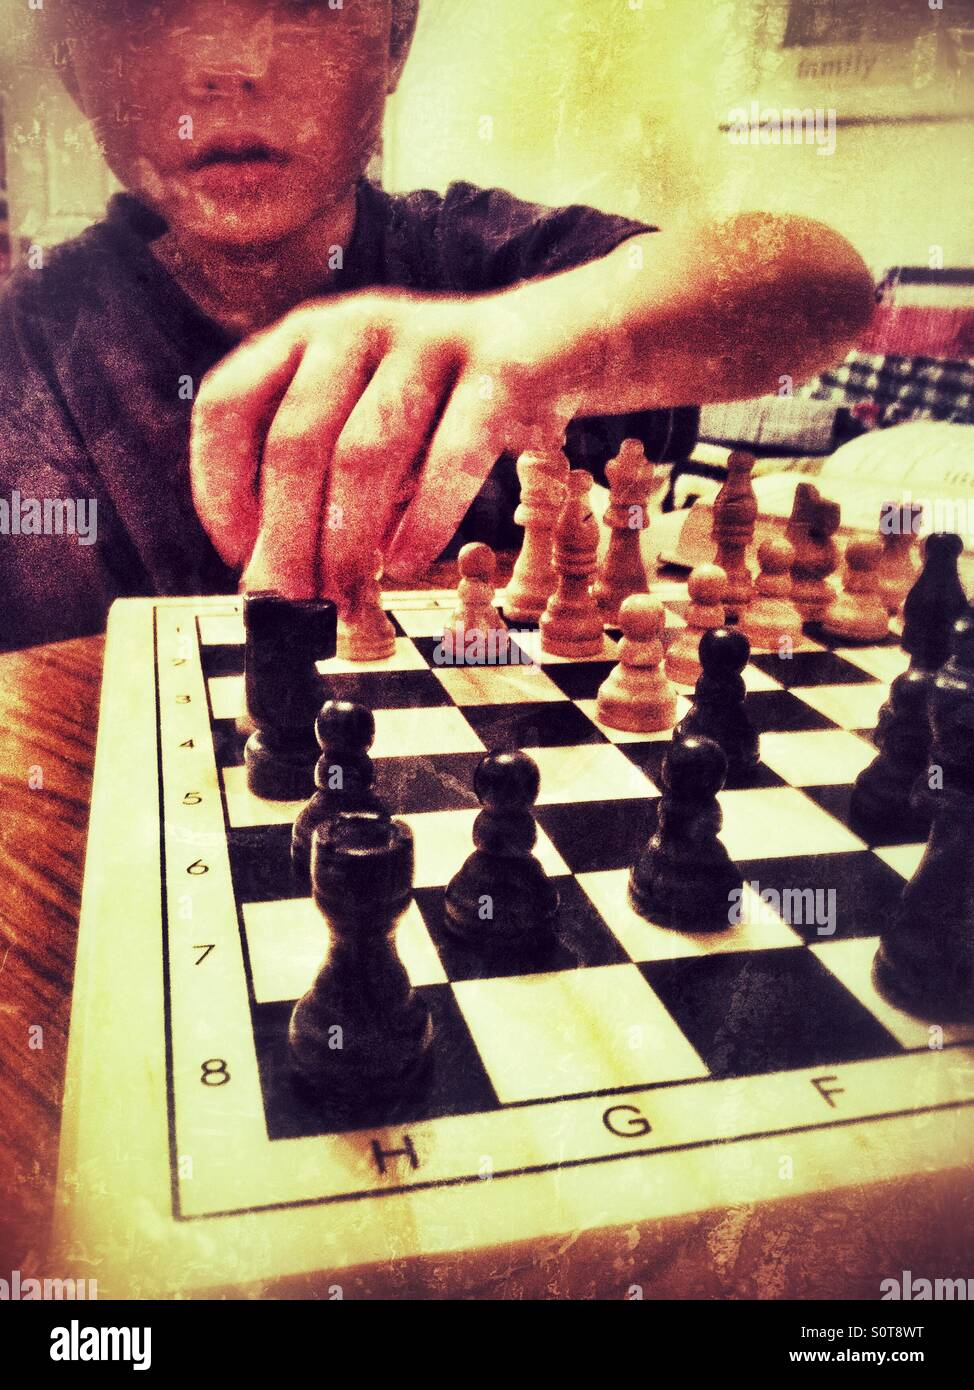 Jugando al ajedrez Imagen De Stock